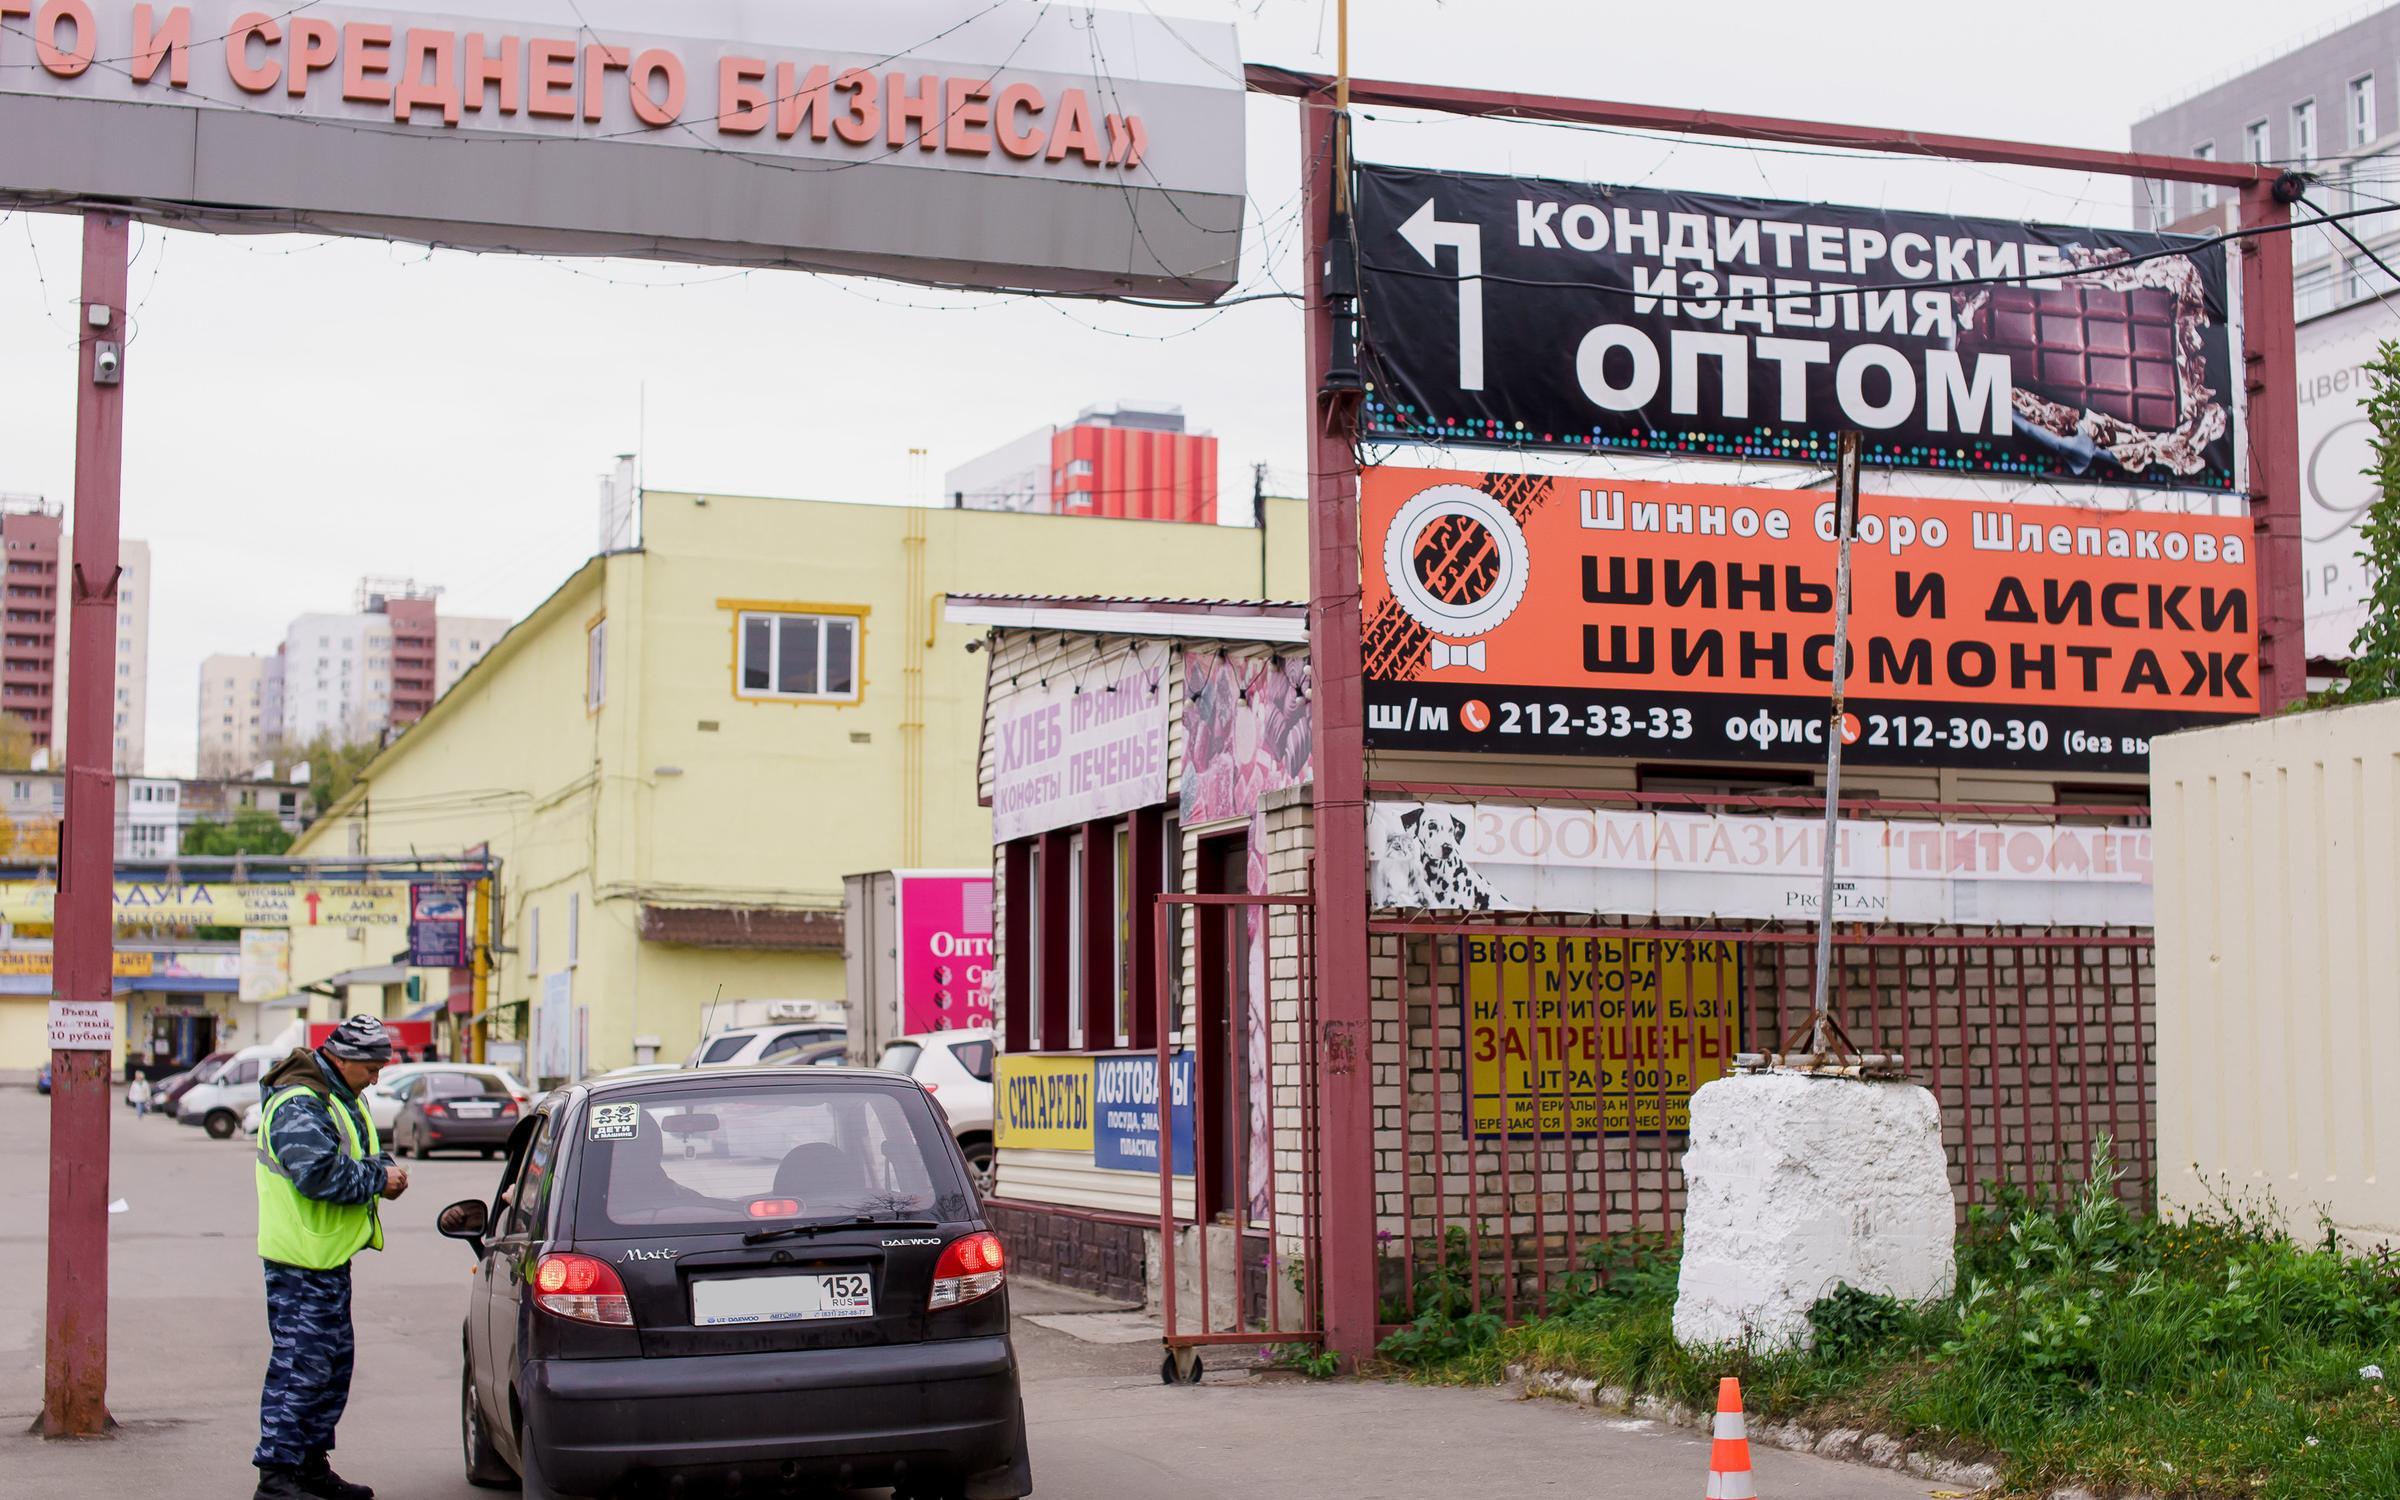 фотография Шинное бюро Шлепакова улица Бекетова, 3А корп. 33